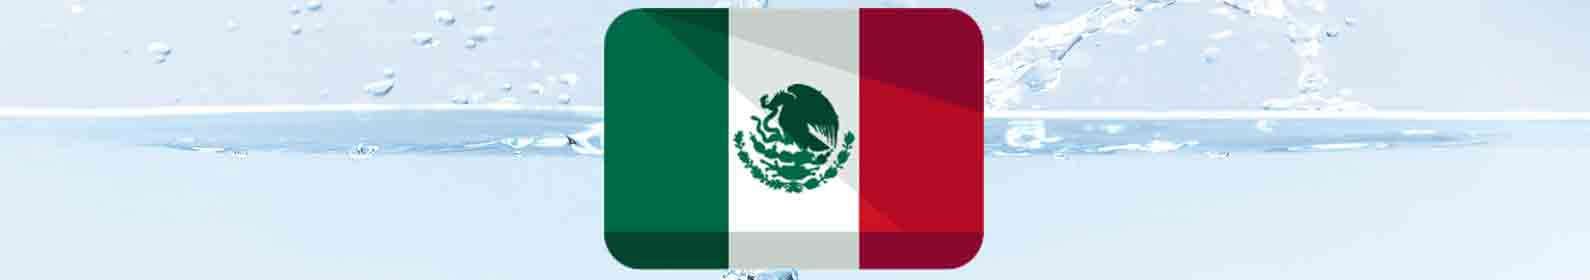 water-treatment-mexico.jpg